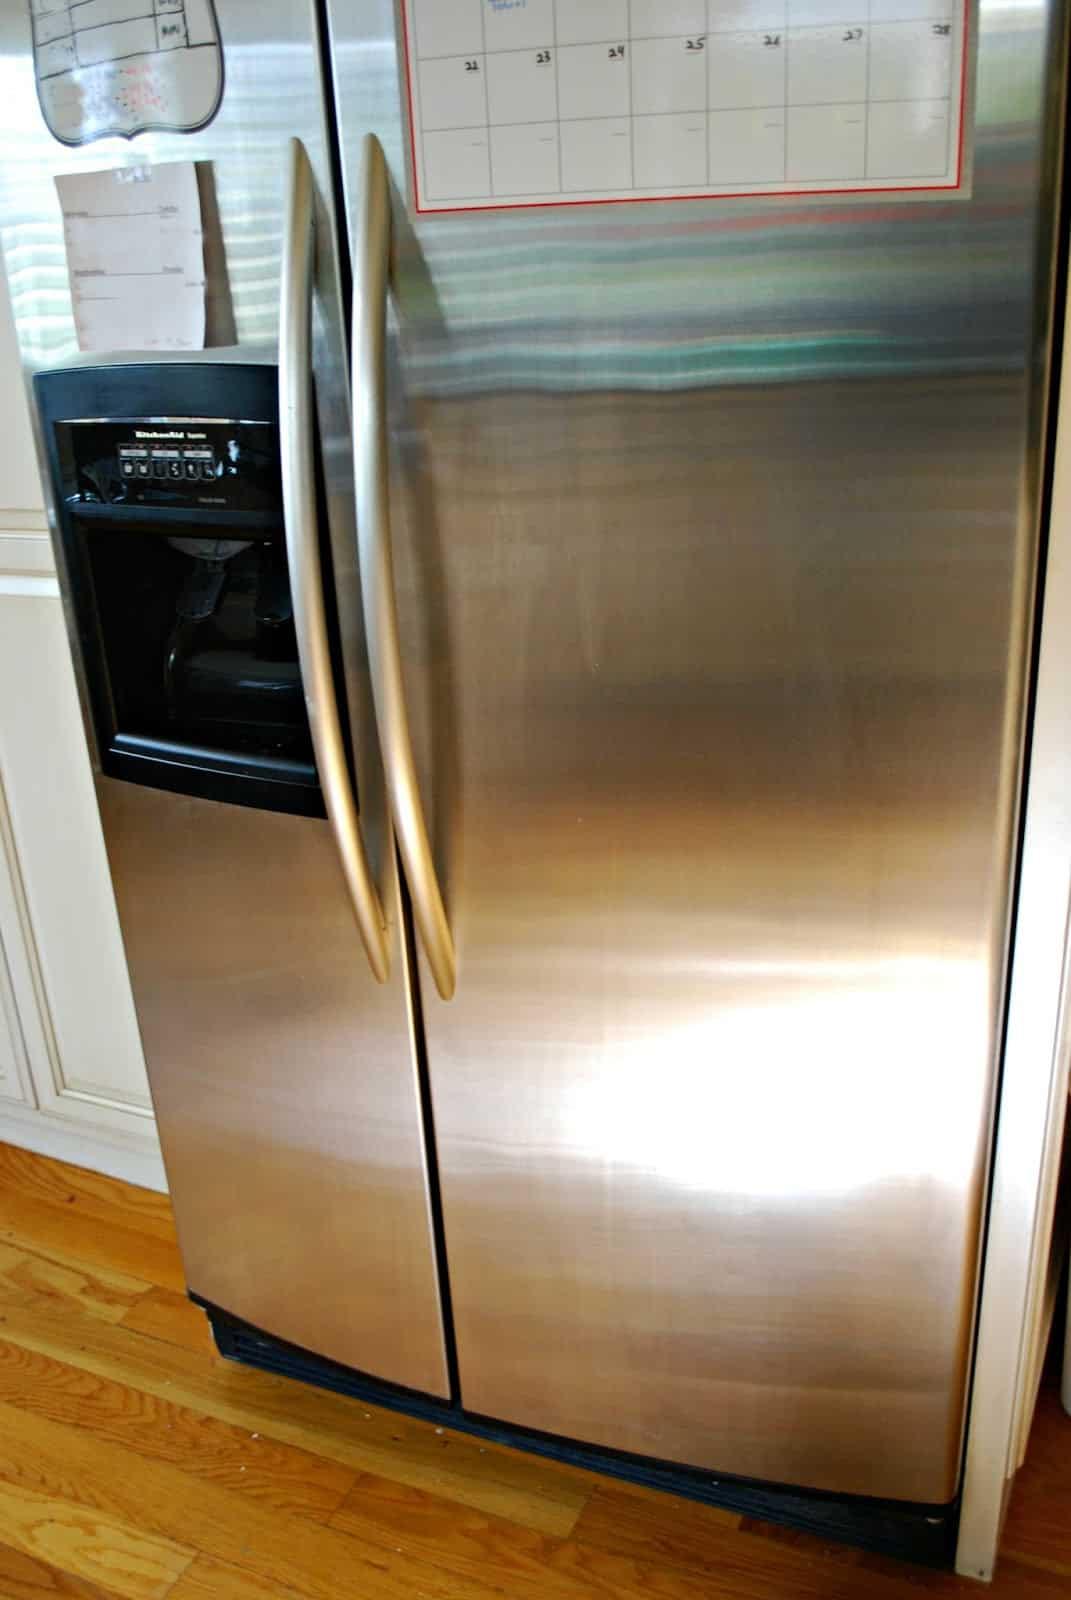 clean refrigerator #ad